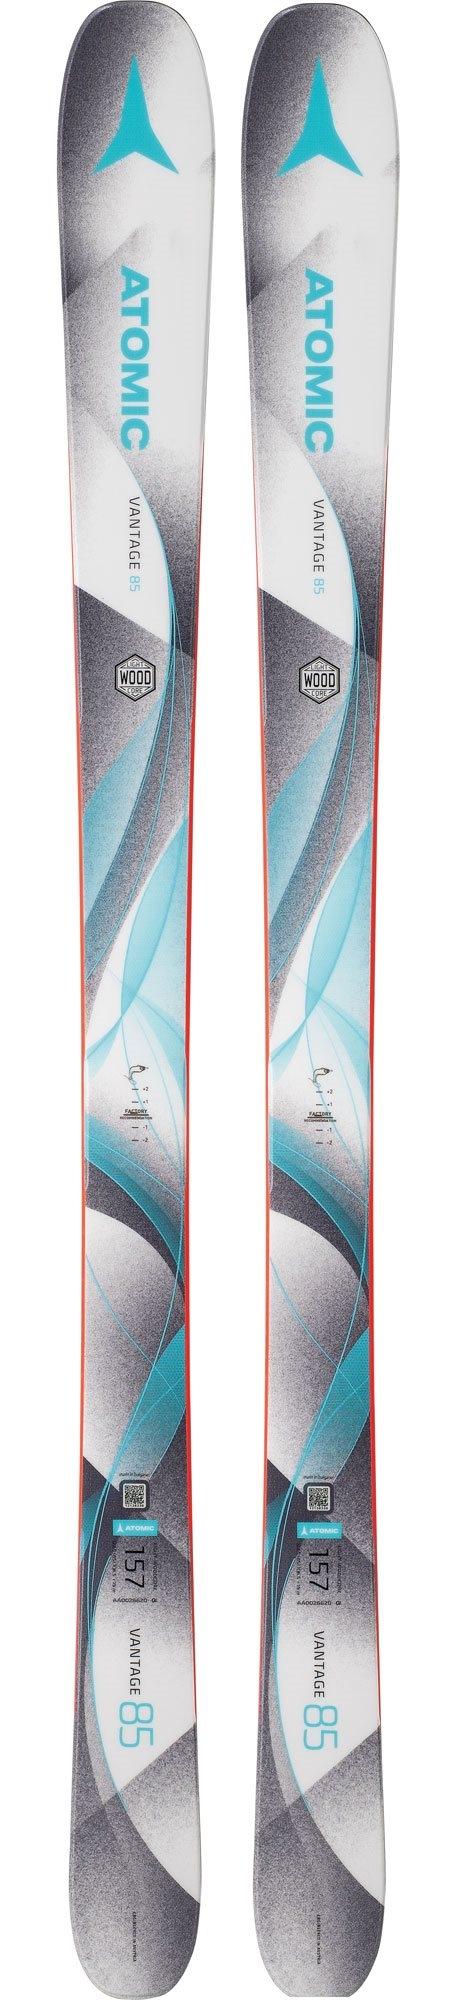 Atomic Vantage 85 Womens Ski 2018 - Snowtrax Store 5e2af02842